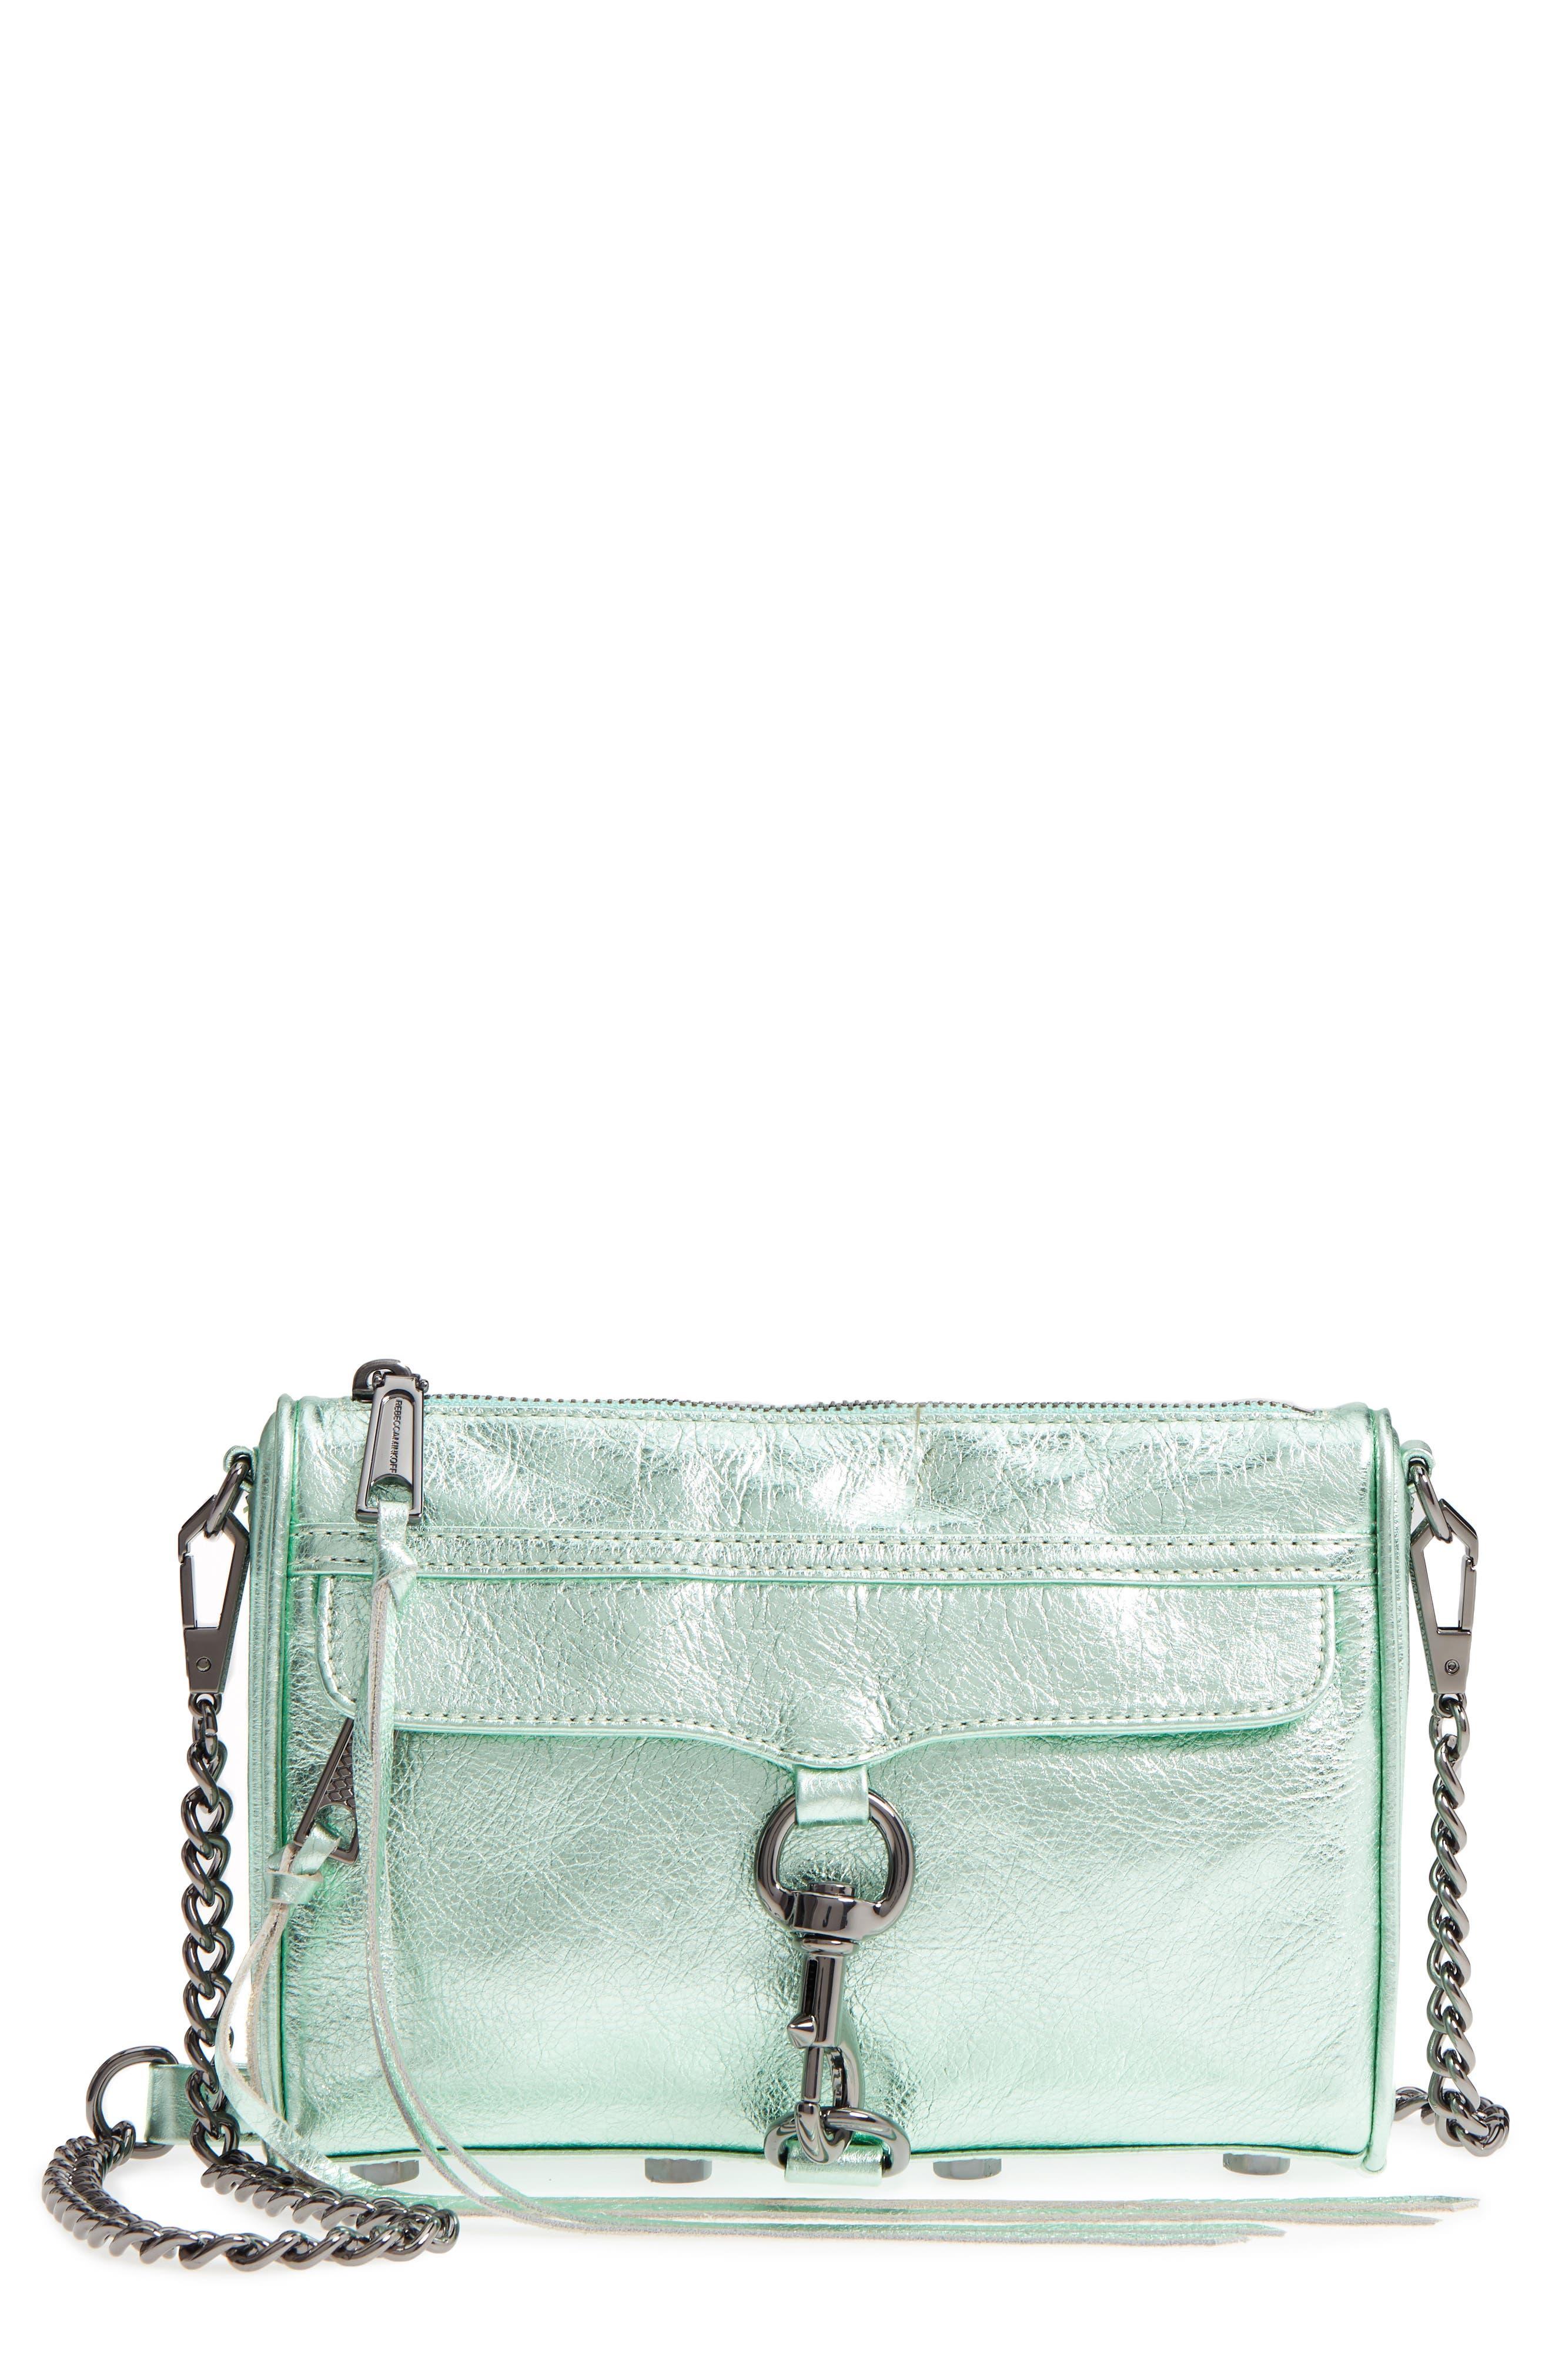 Mini MAC Metallic Leather Convertible Crossbody Bag,                         Main,                         color, Mint